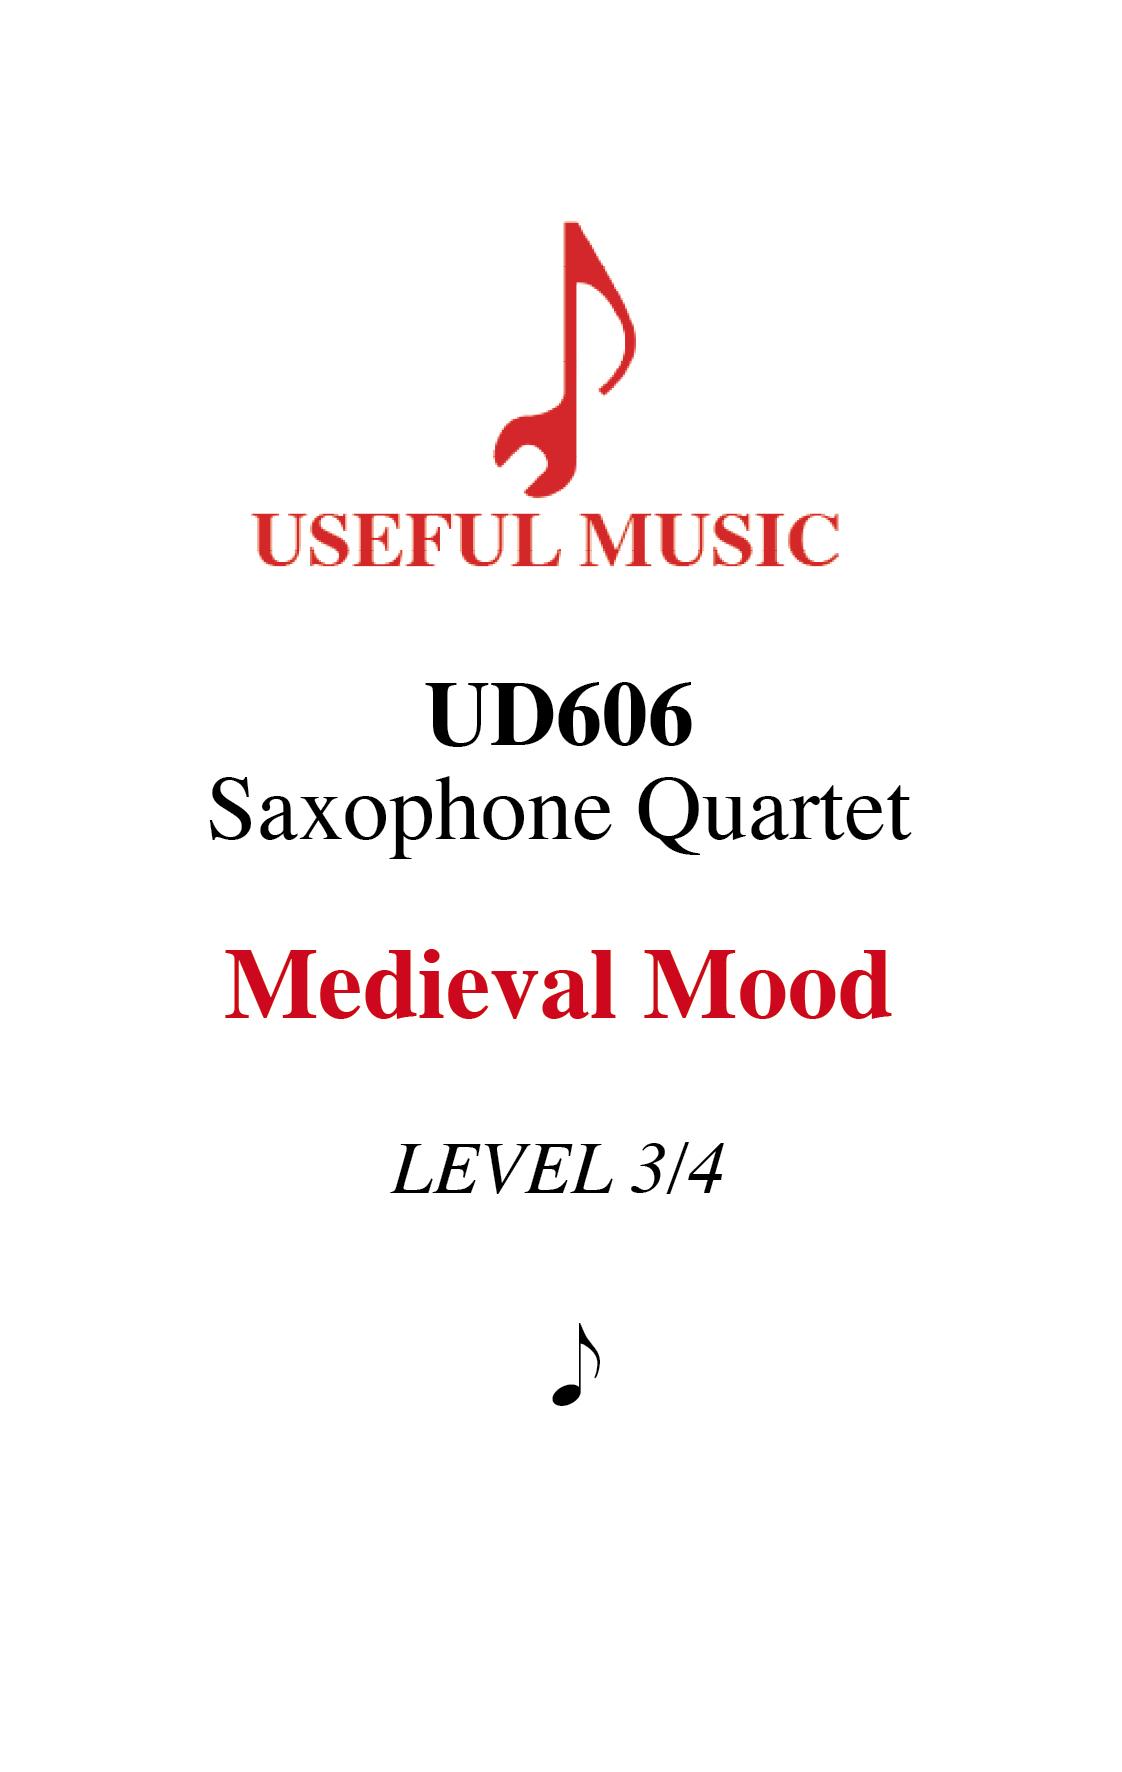 Medieval Mood - Saxophone Quartet